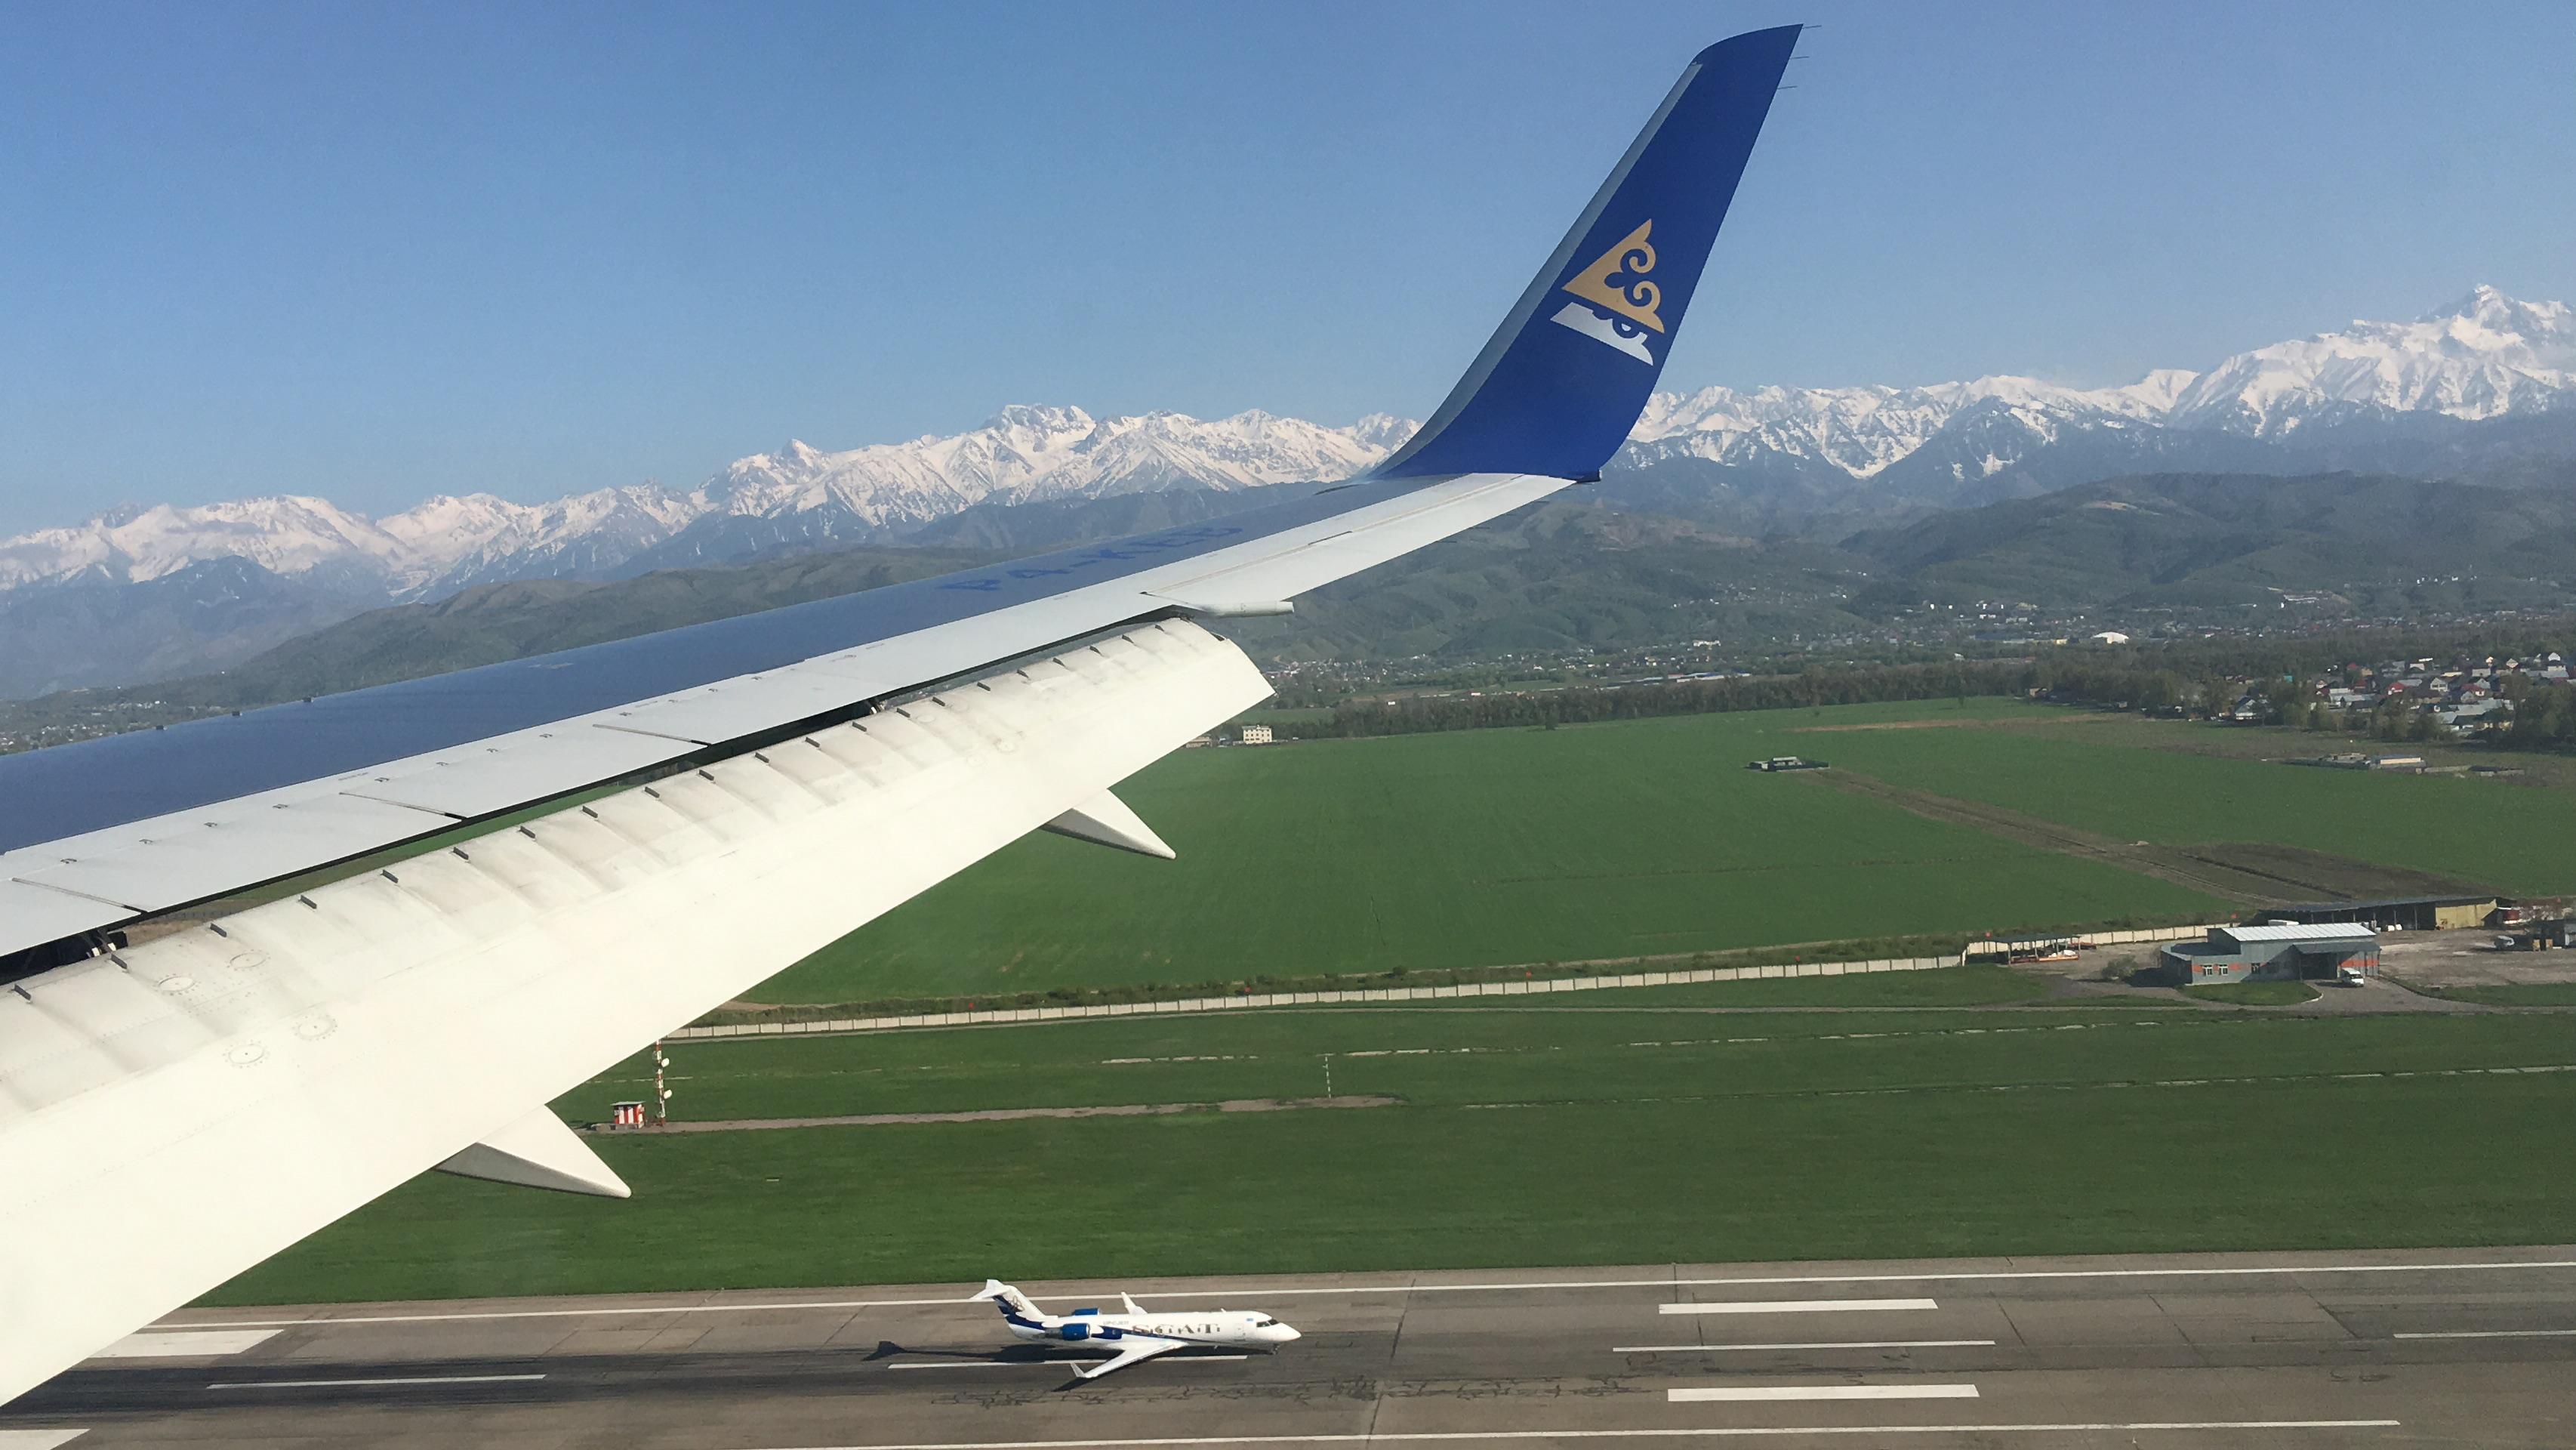 Landing in Almaty on Air Astana (April, 2016)